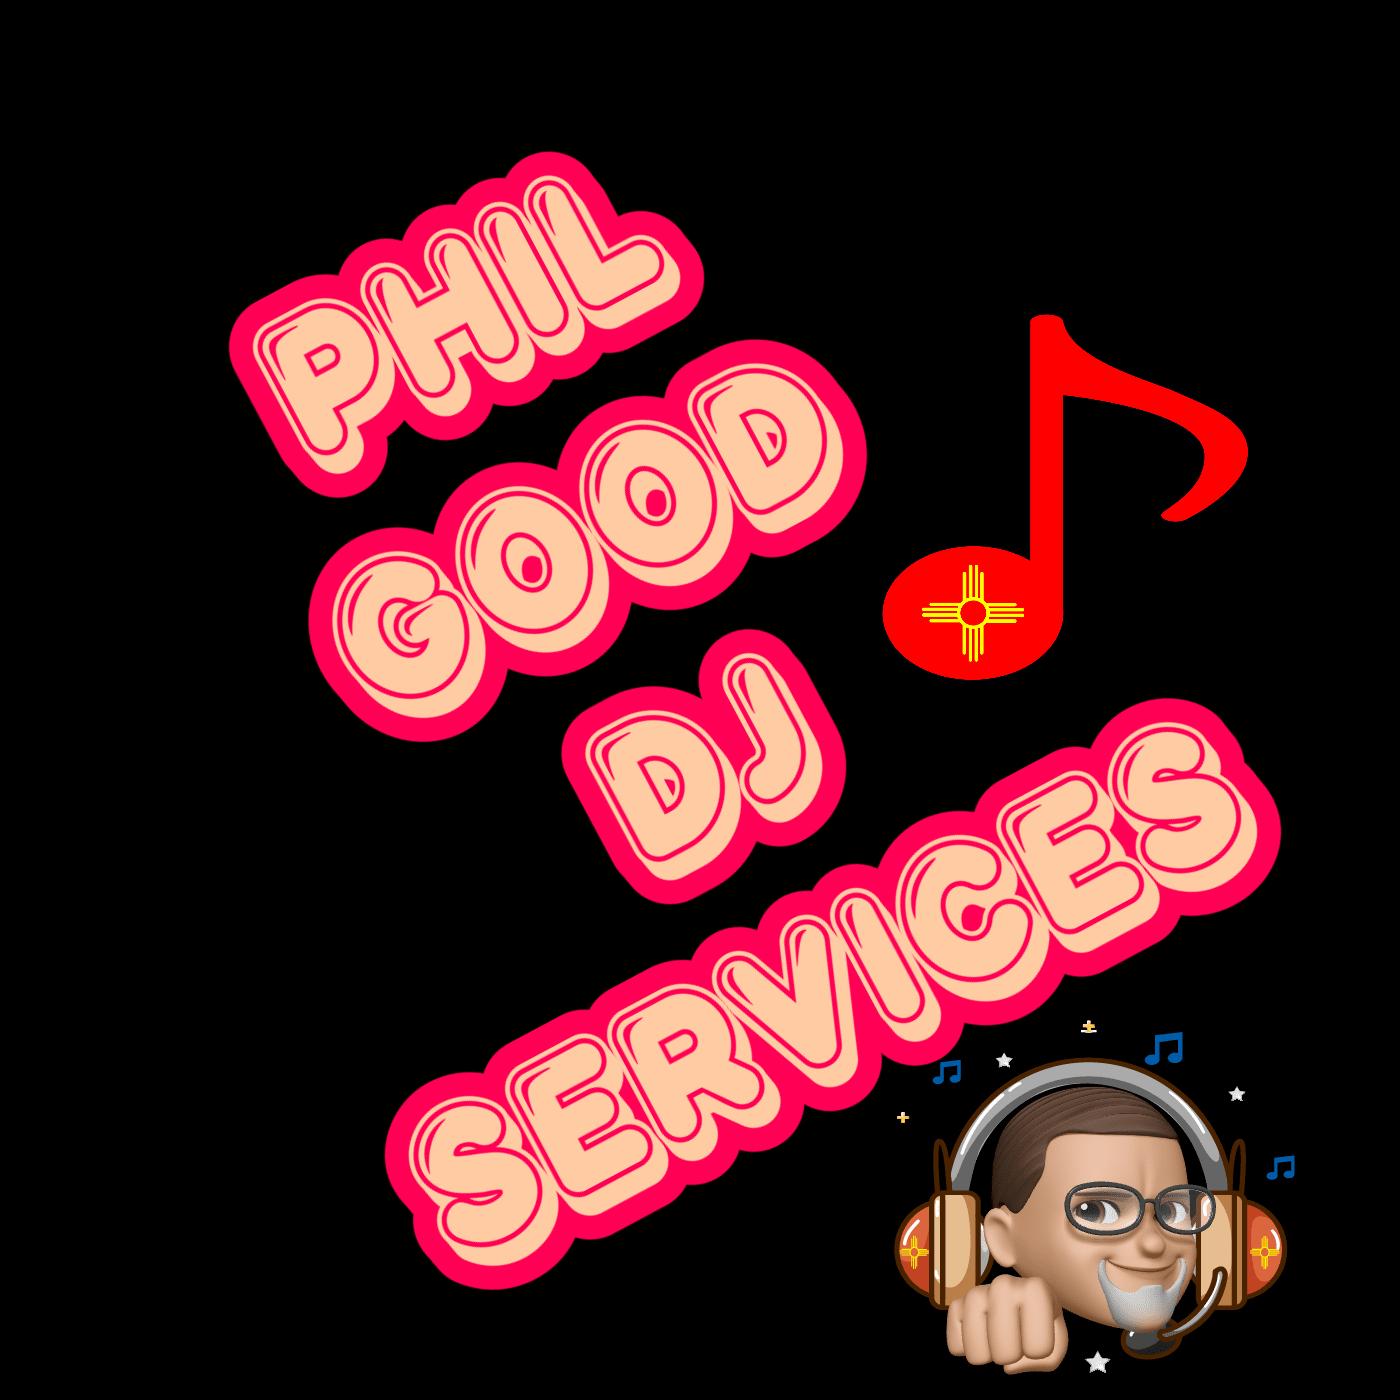 Phil Good DJ Services